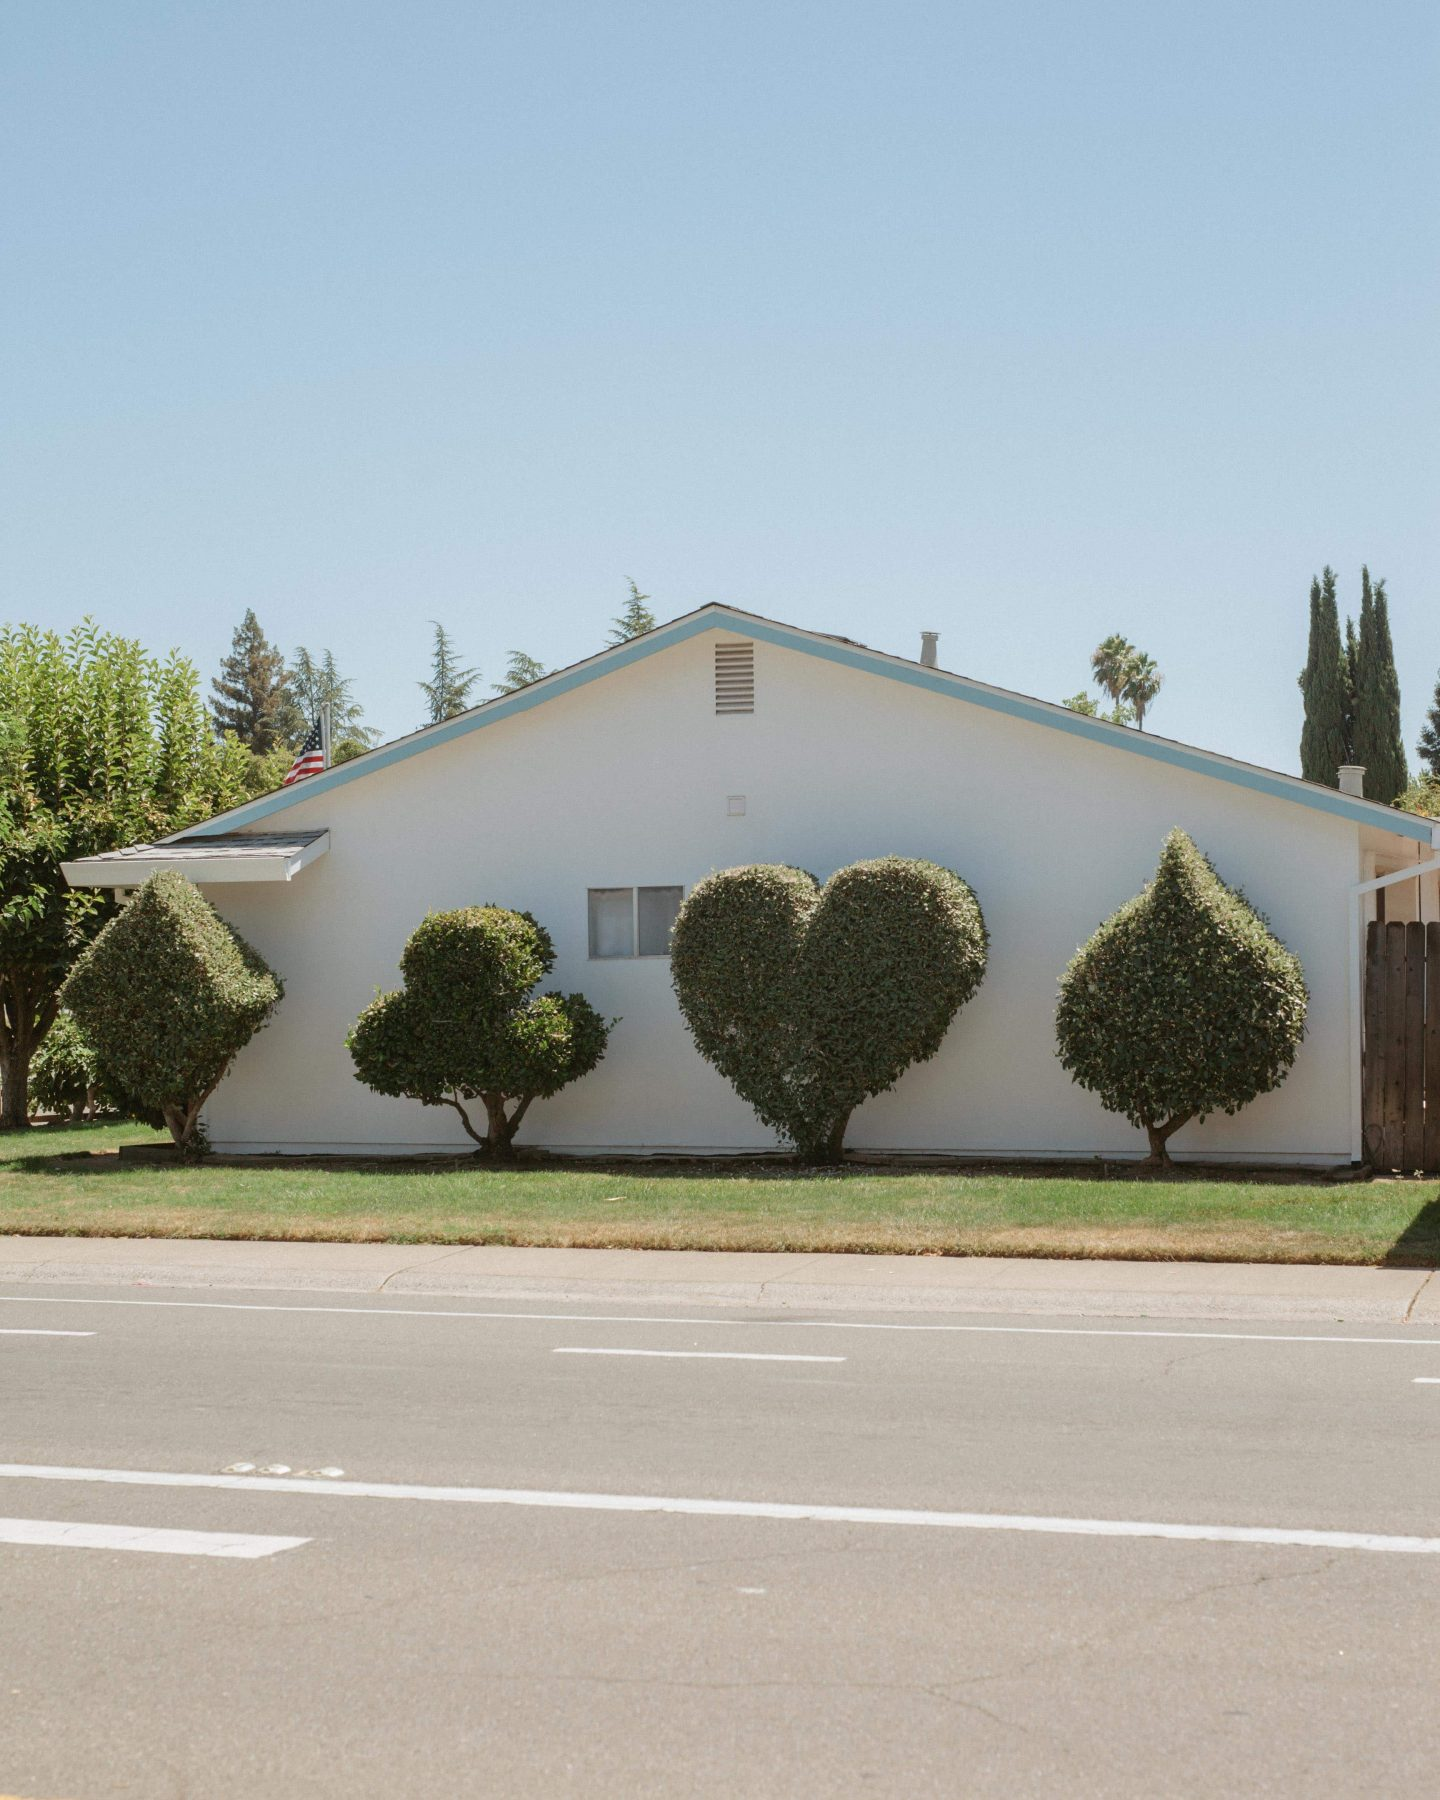 IGNANT-Photography-Enoch-Ku-Ordinary-Sacramento-07